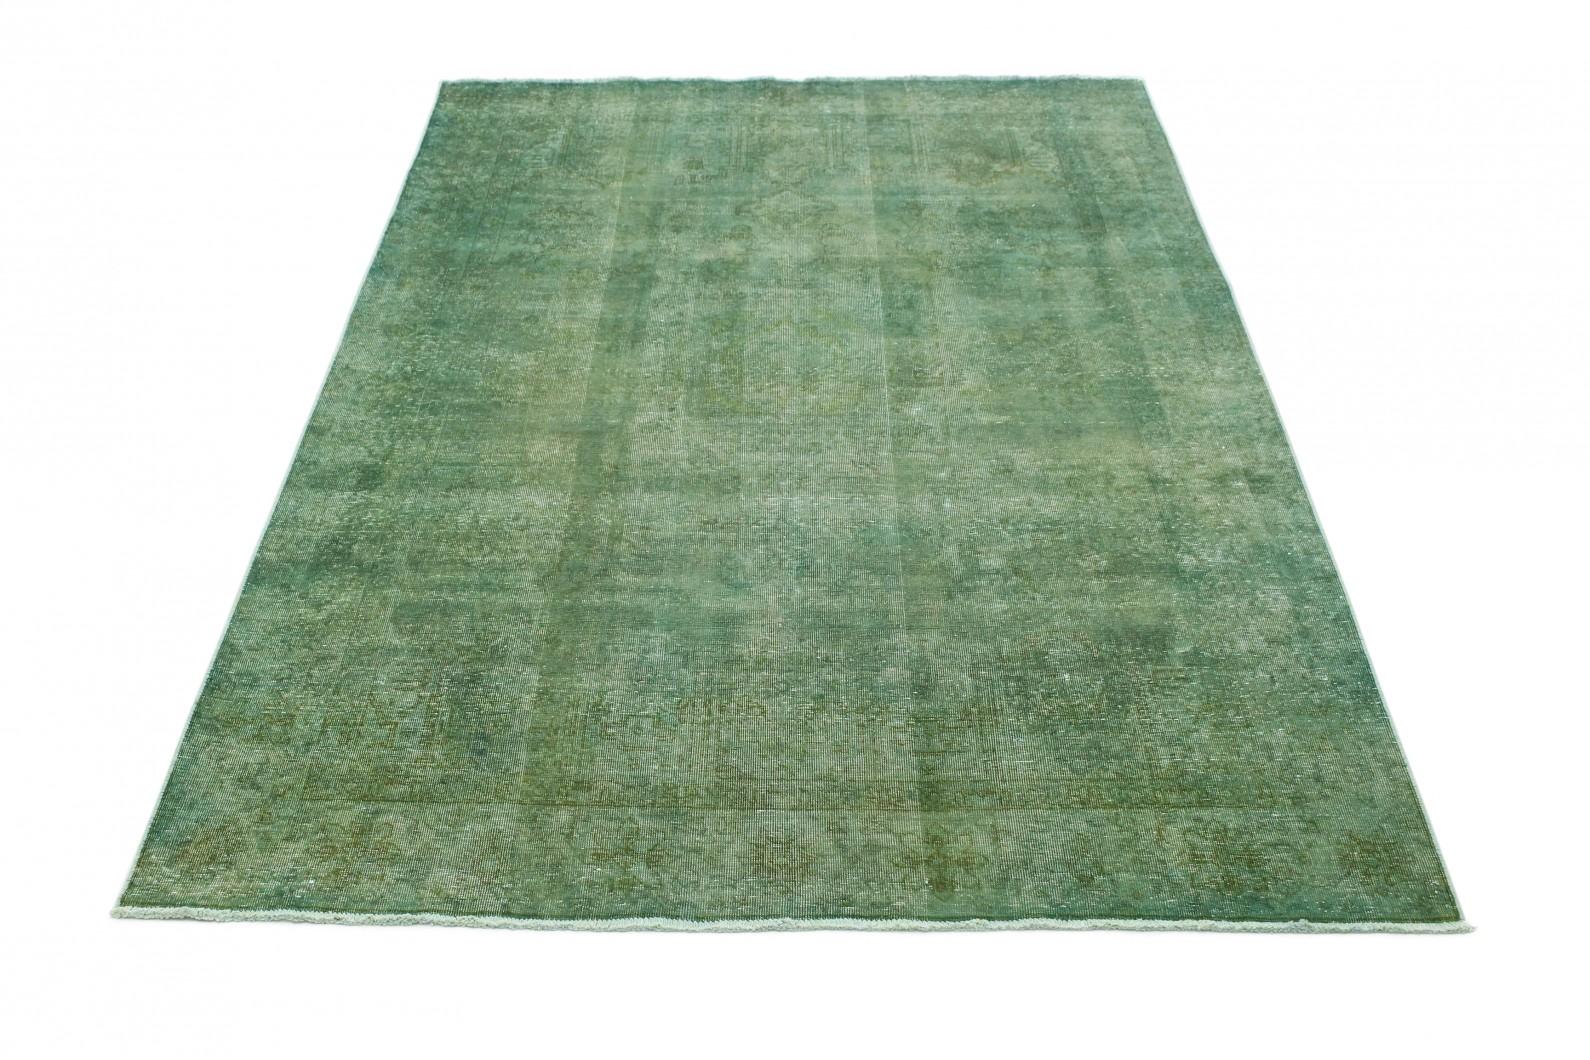 vintage teppich gr n in 300x190 1001 3702 bei kaufen. Black Bedroom Furniture Sets. Home Design Ideas